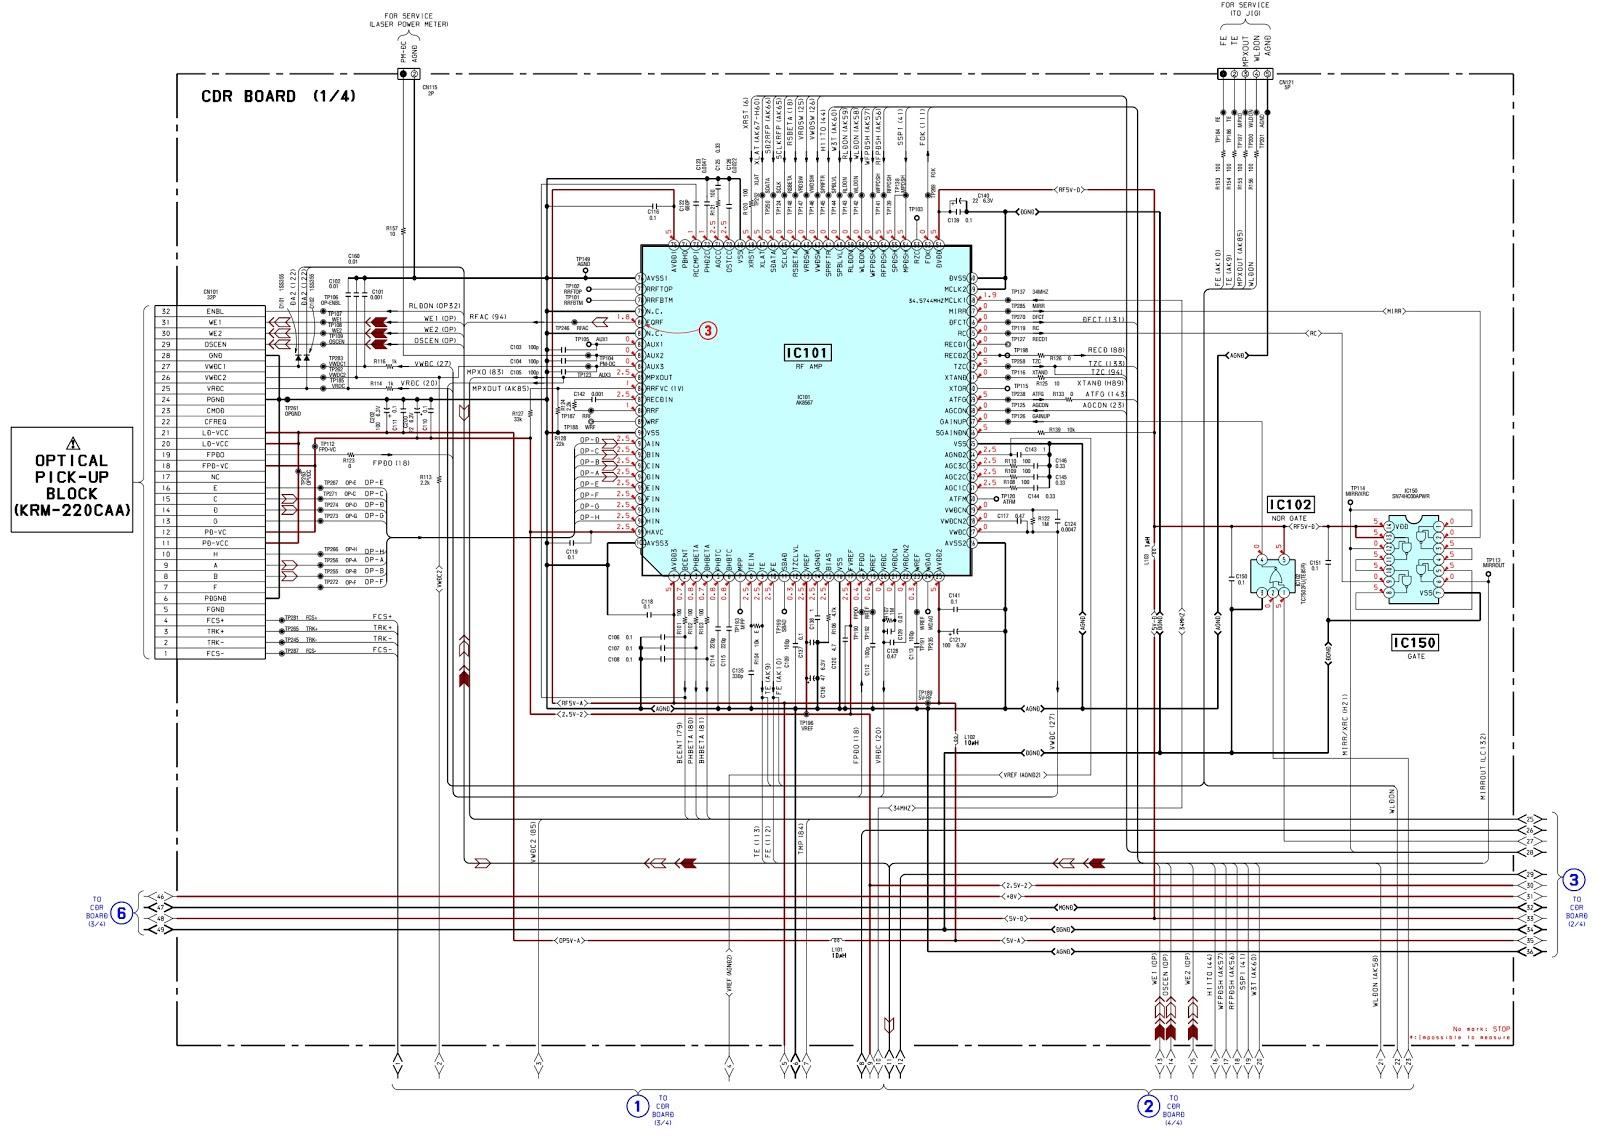 Schön Sony Deck Schaltplan Ideen - Schaltplan Serie Circuit ...